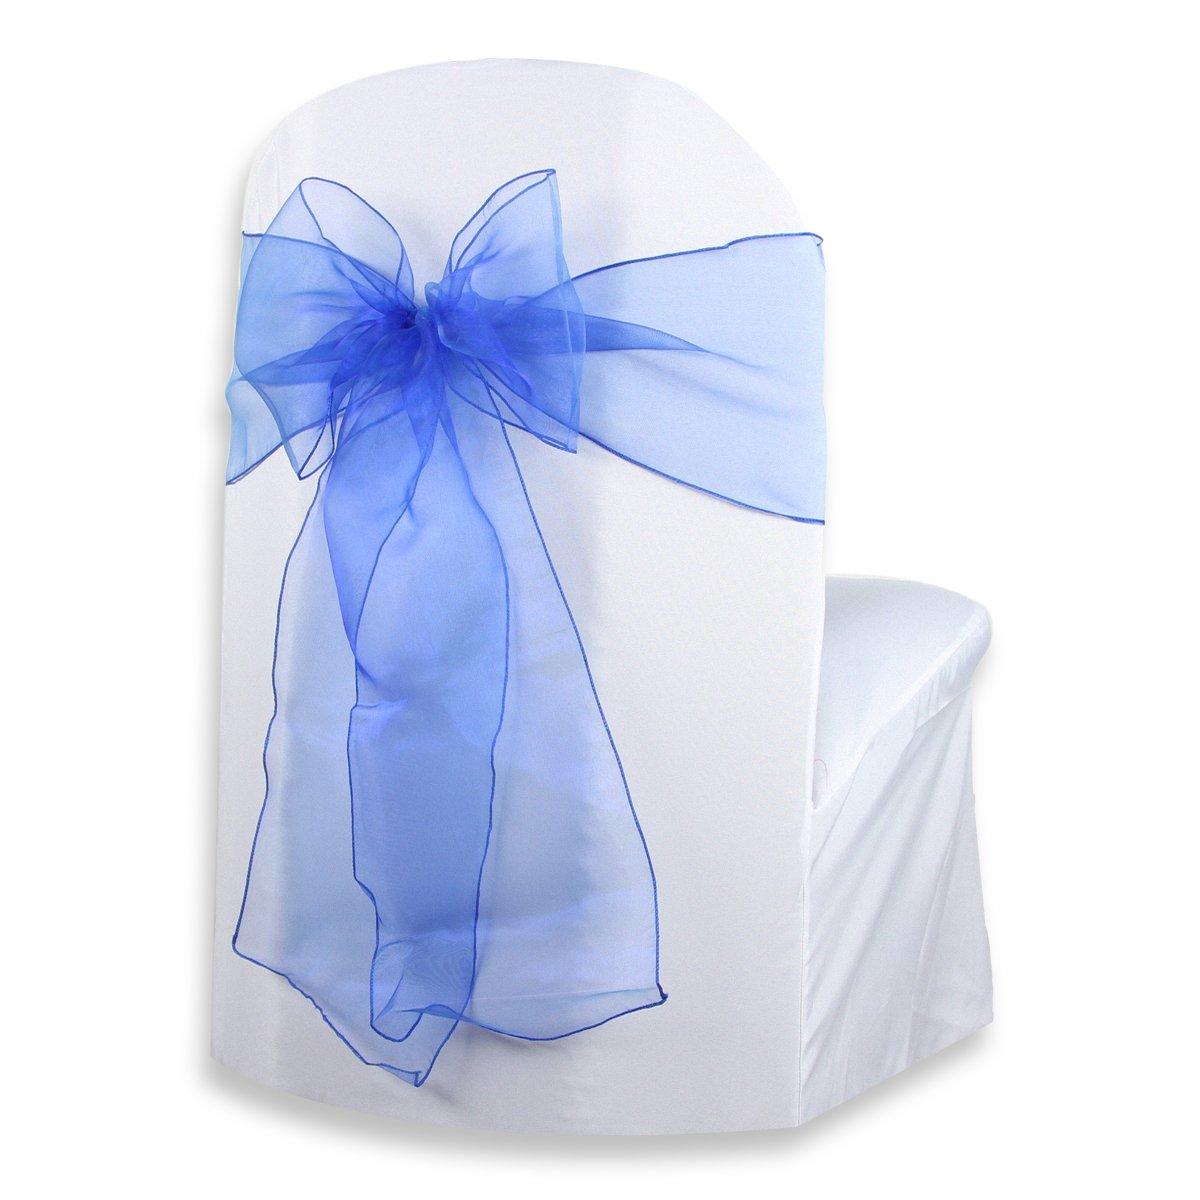 Sparkles Make It特別な50-pcs 108 x 8インチオーガンザ椅子カバー弓ウェディングサッシロイヤルブルー   B019XWWFE4